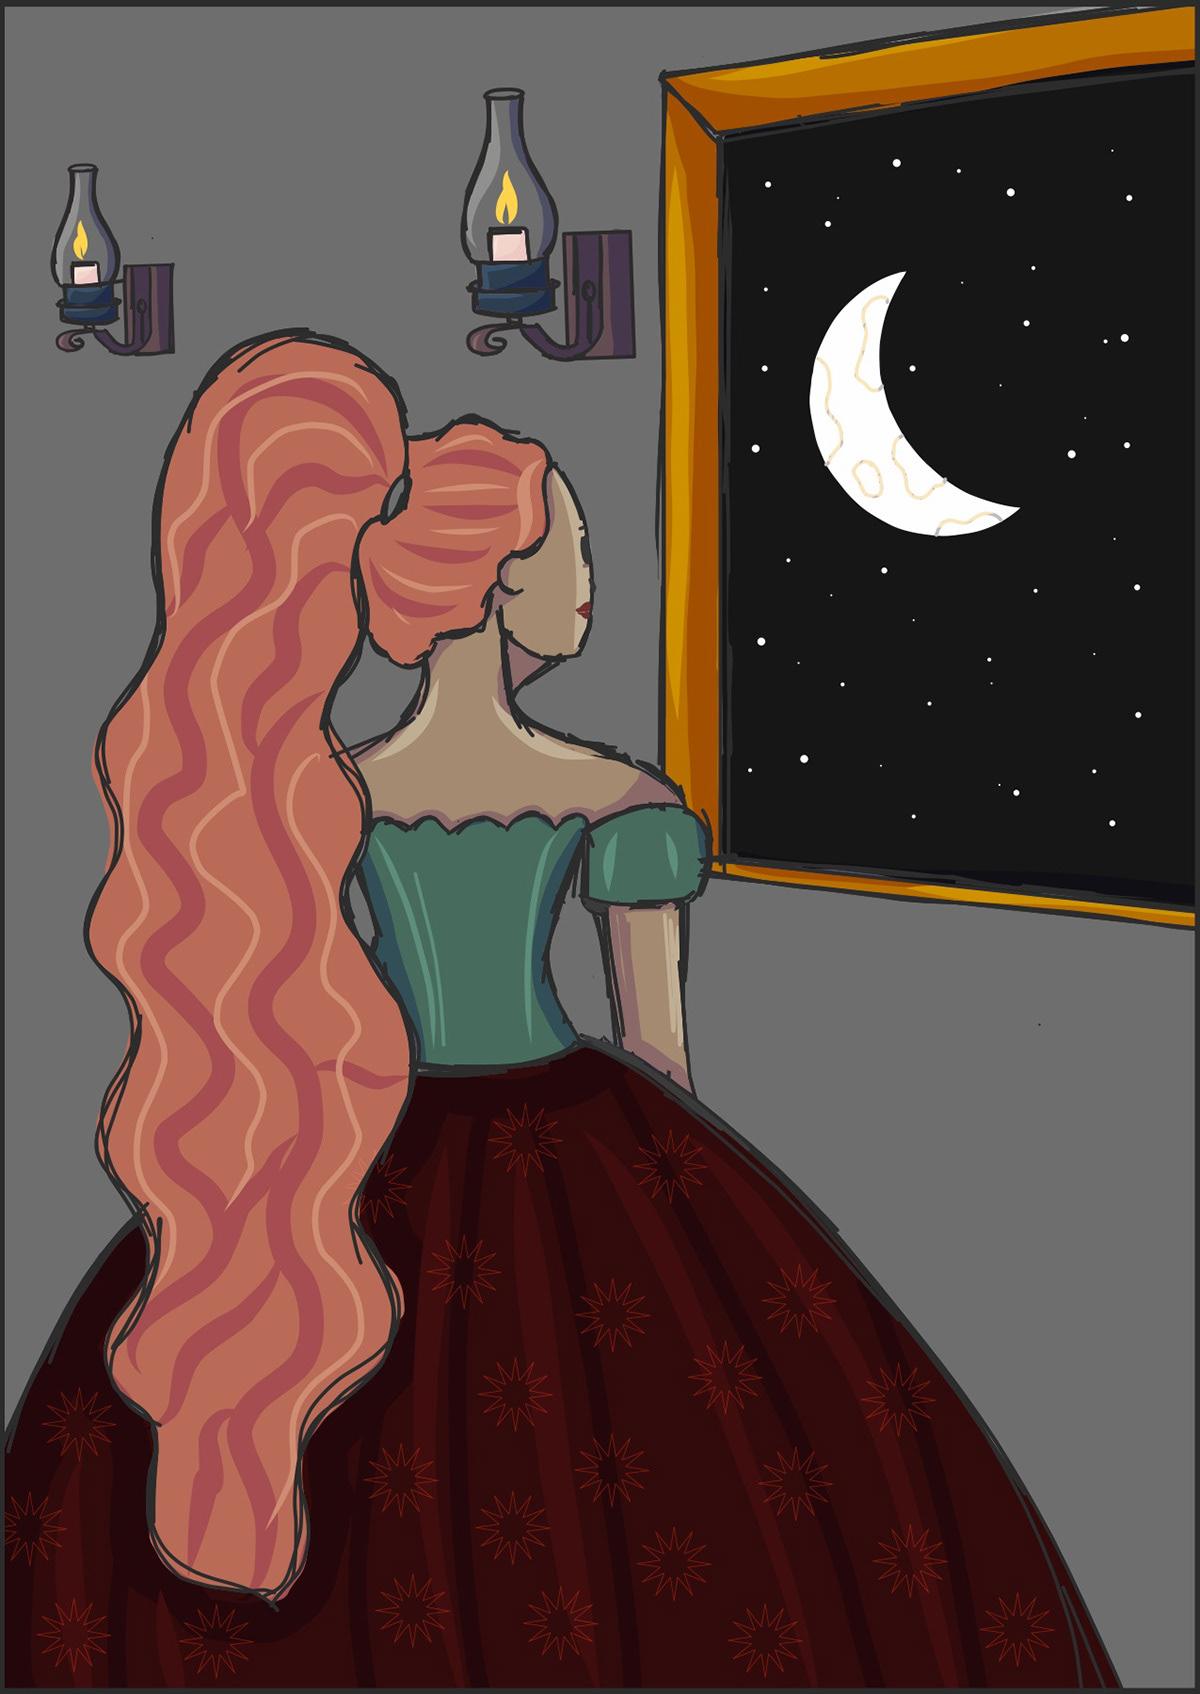 aesthetic aestheticart DARKACADEMIA darkacademiaart ILLUSTRATION  portrairts posestudy Princess PRINCESSART vintage